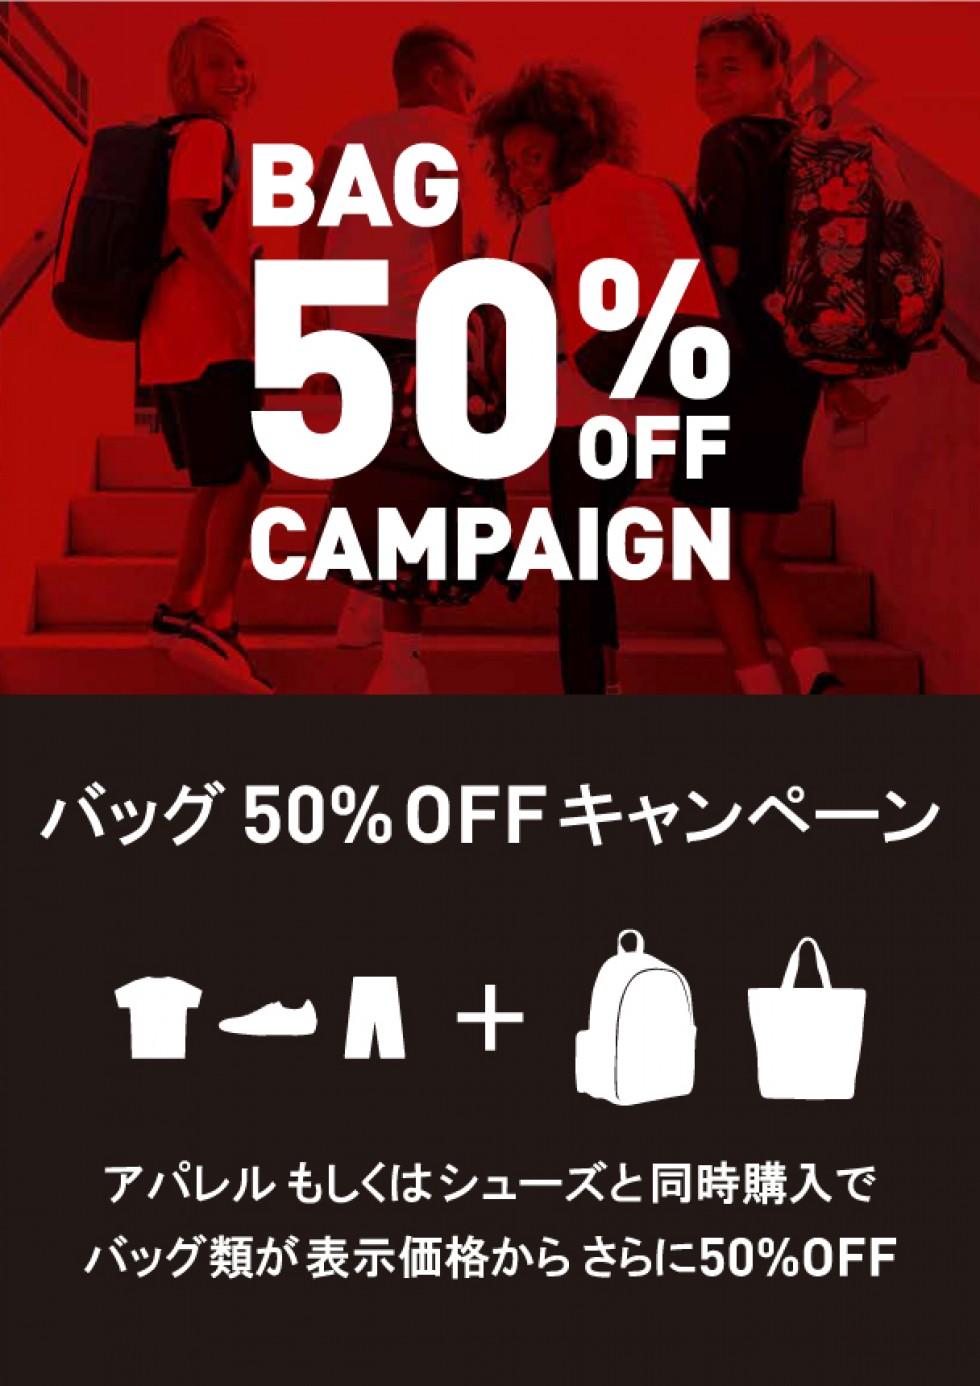 【BAG 半額キャンペーン】